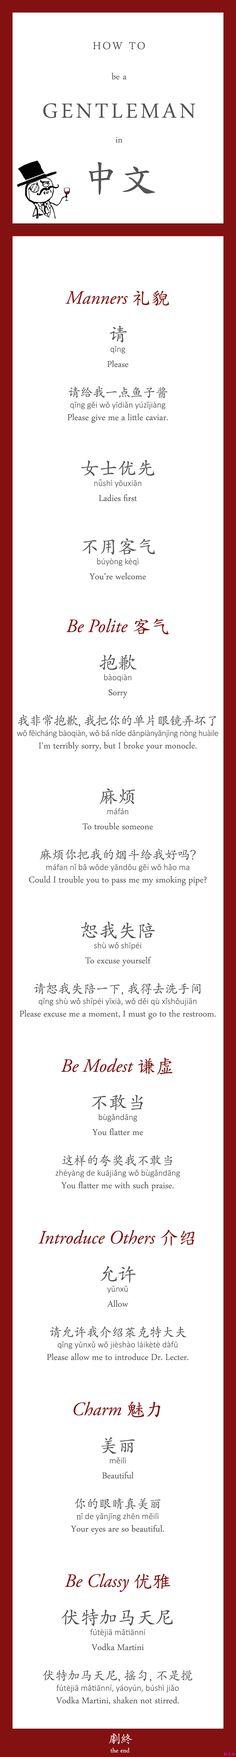 How to be a Gentleman in Mandarin